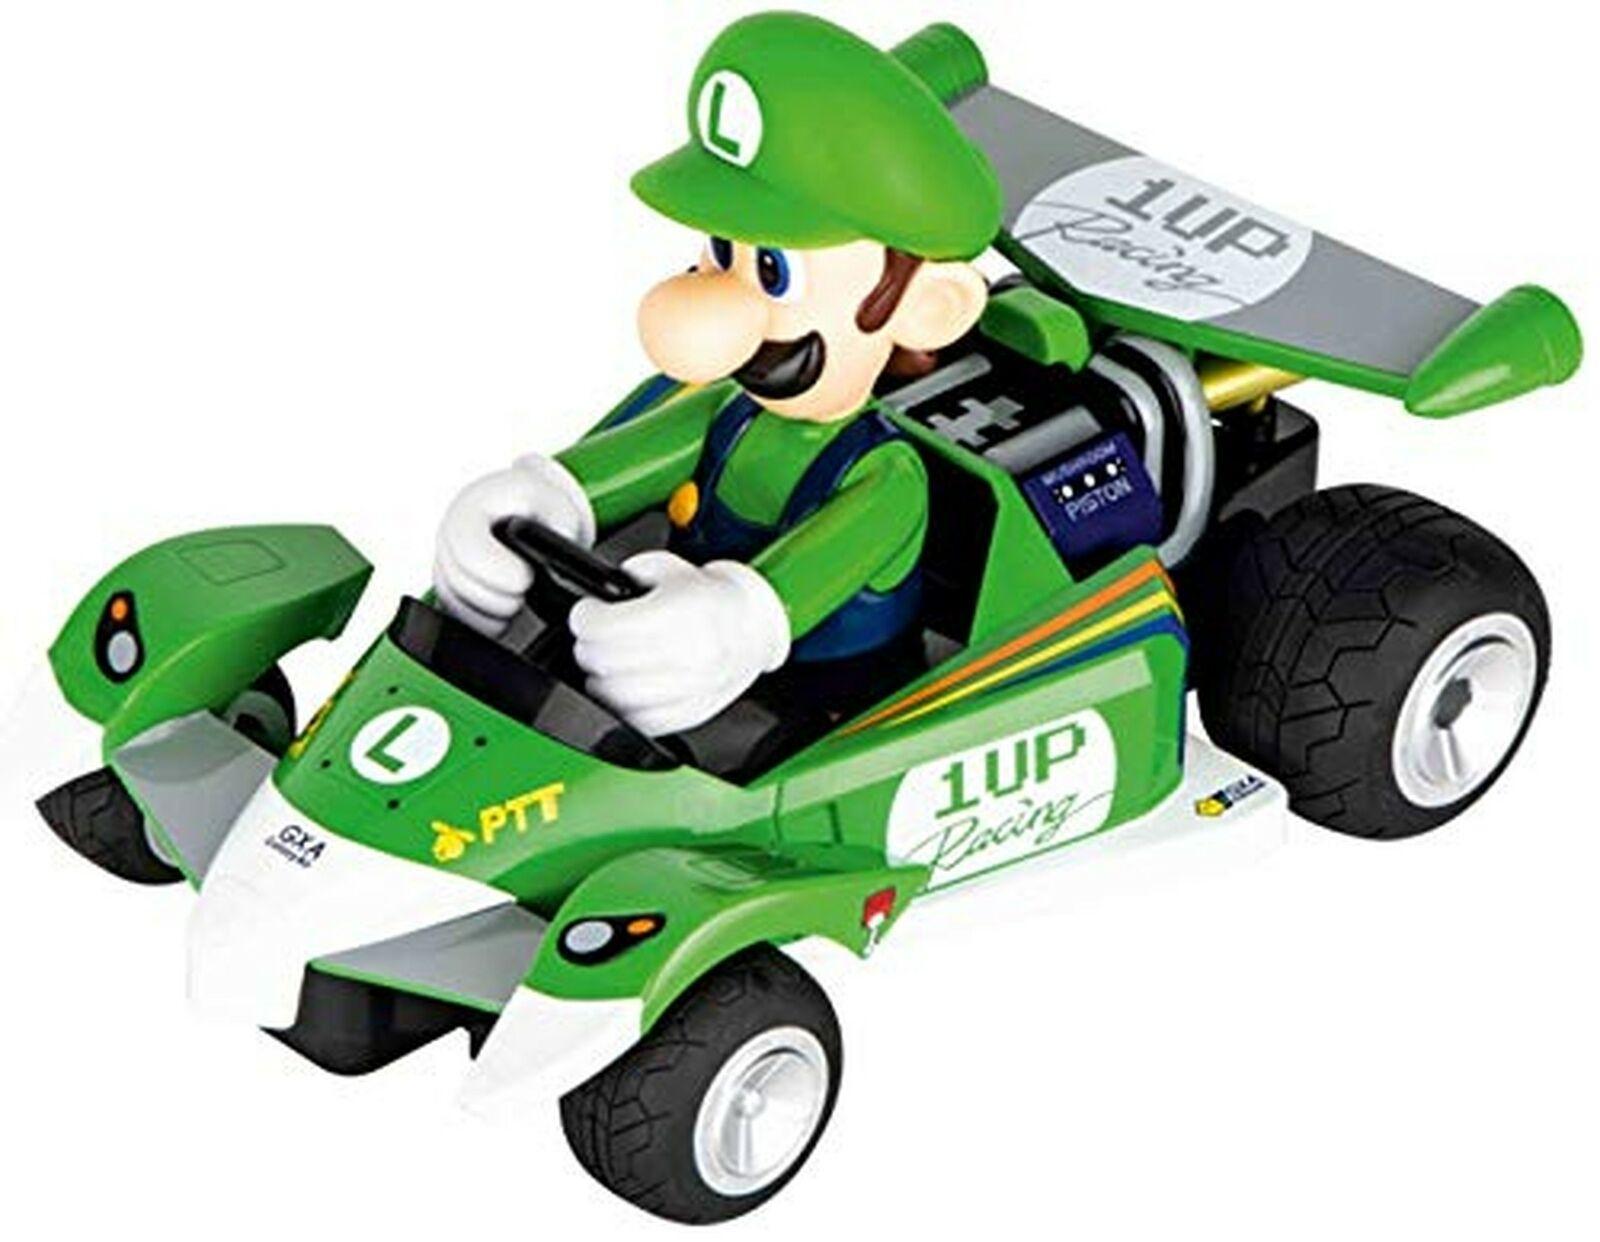 autorera RC Mario Kart Circuit specialeeE –  Luigi  il più economico